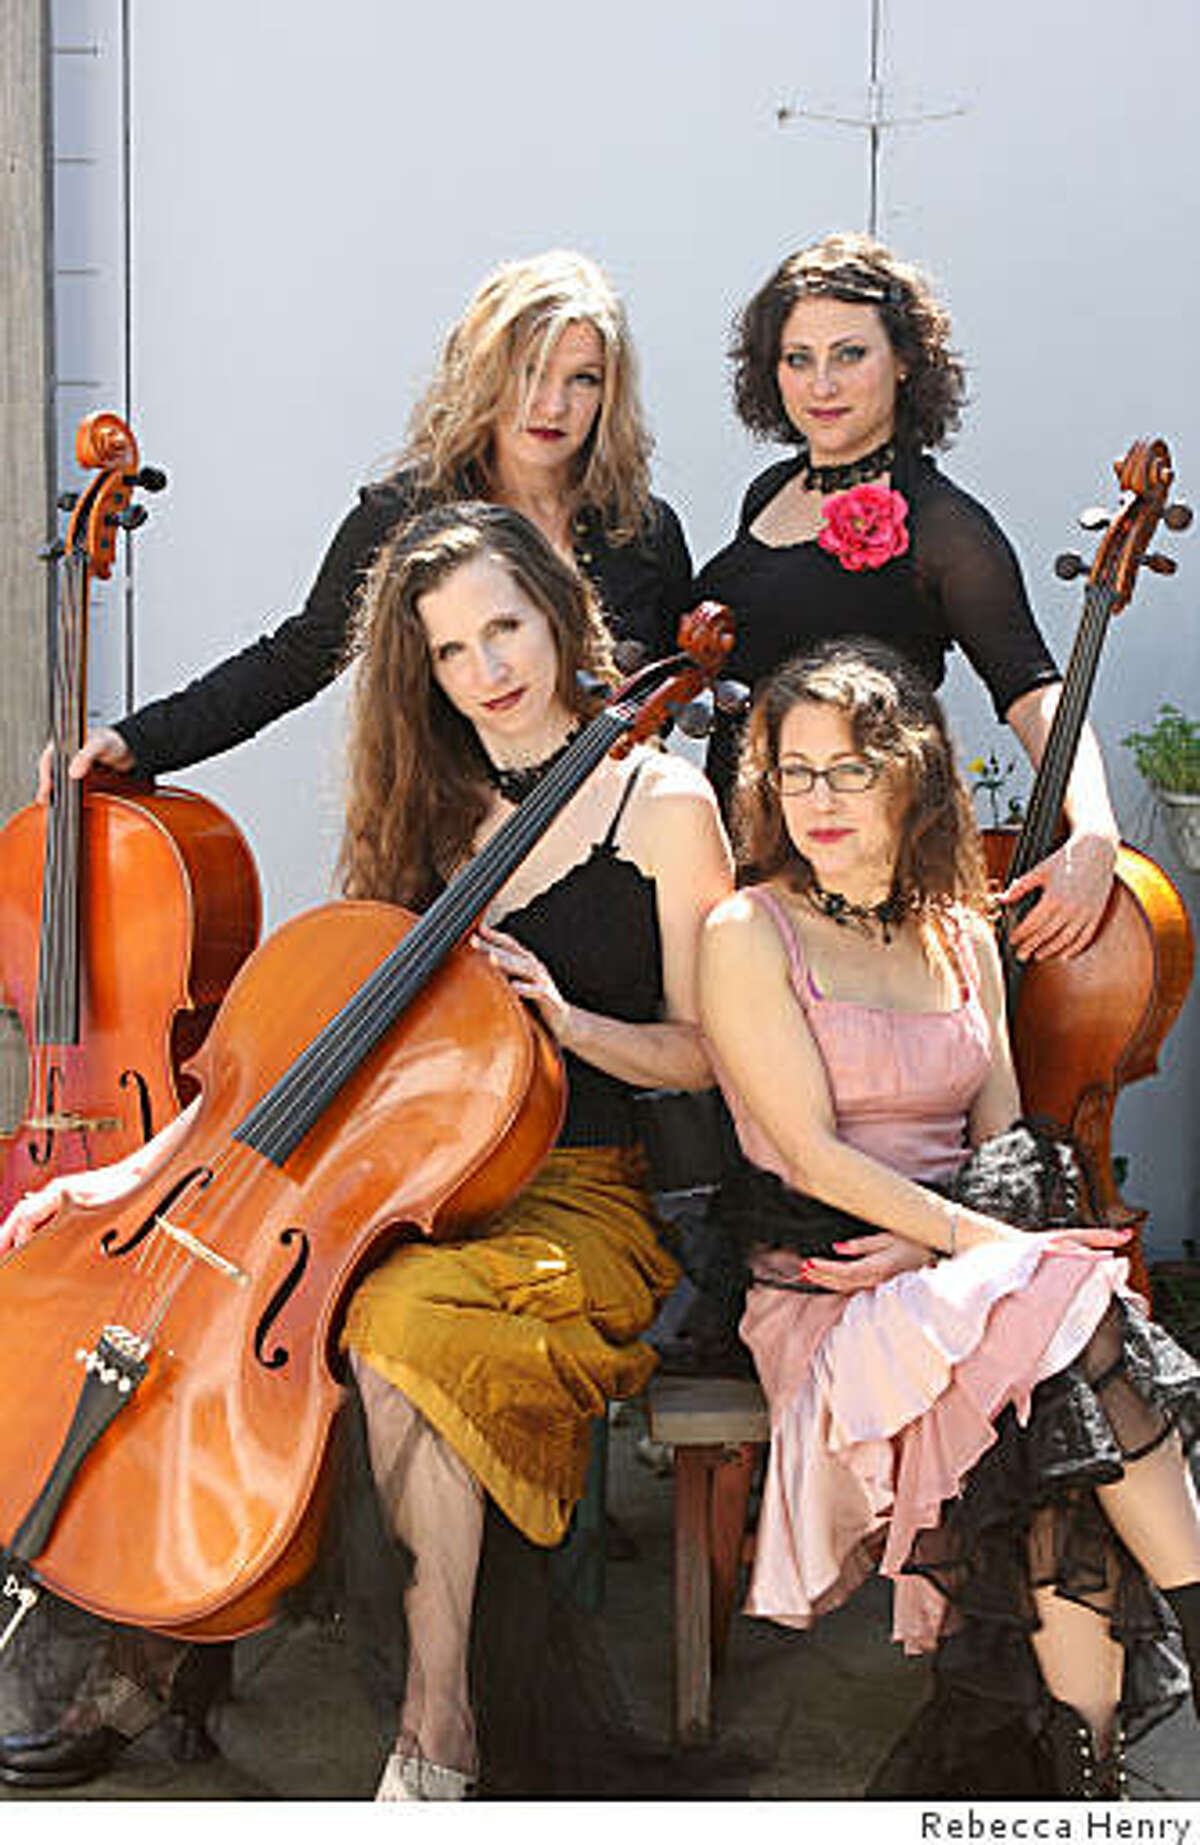 Amy X. Neuburg & The Cello ChiXtet, L to R: Elaine Kreston, Elizabeth Vandervennet, Jess Ivry, Amy X. Neuburg